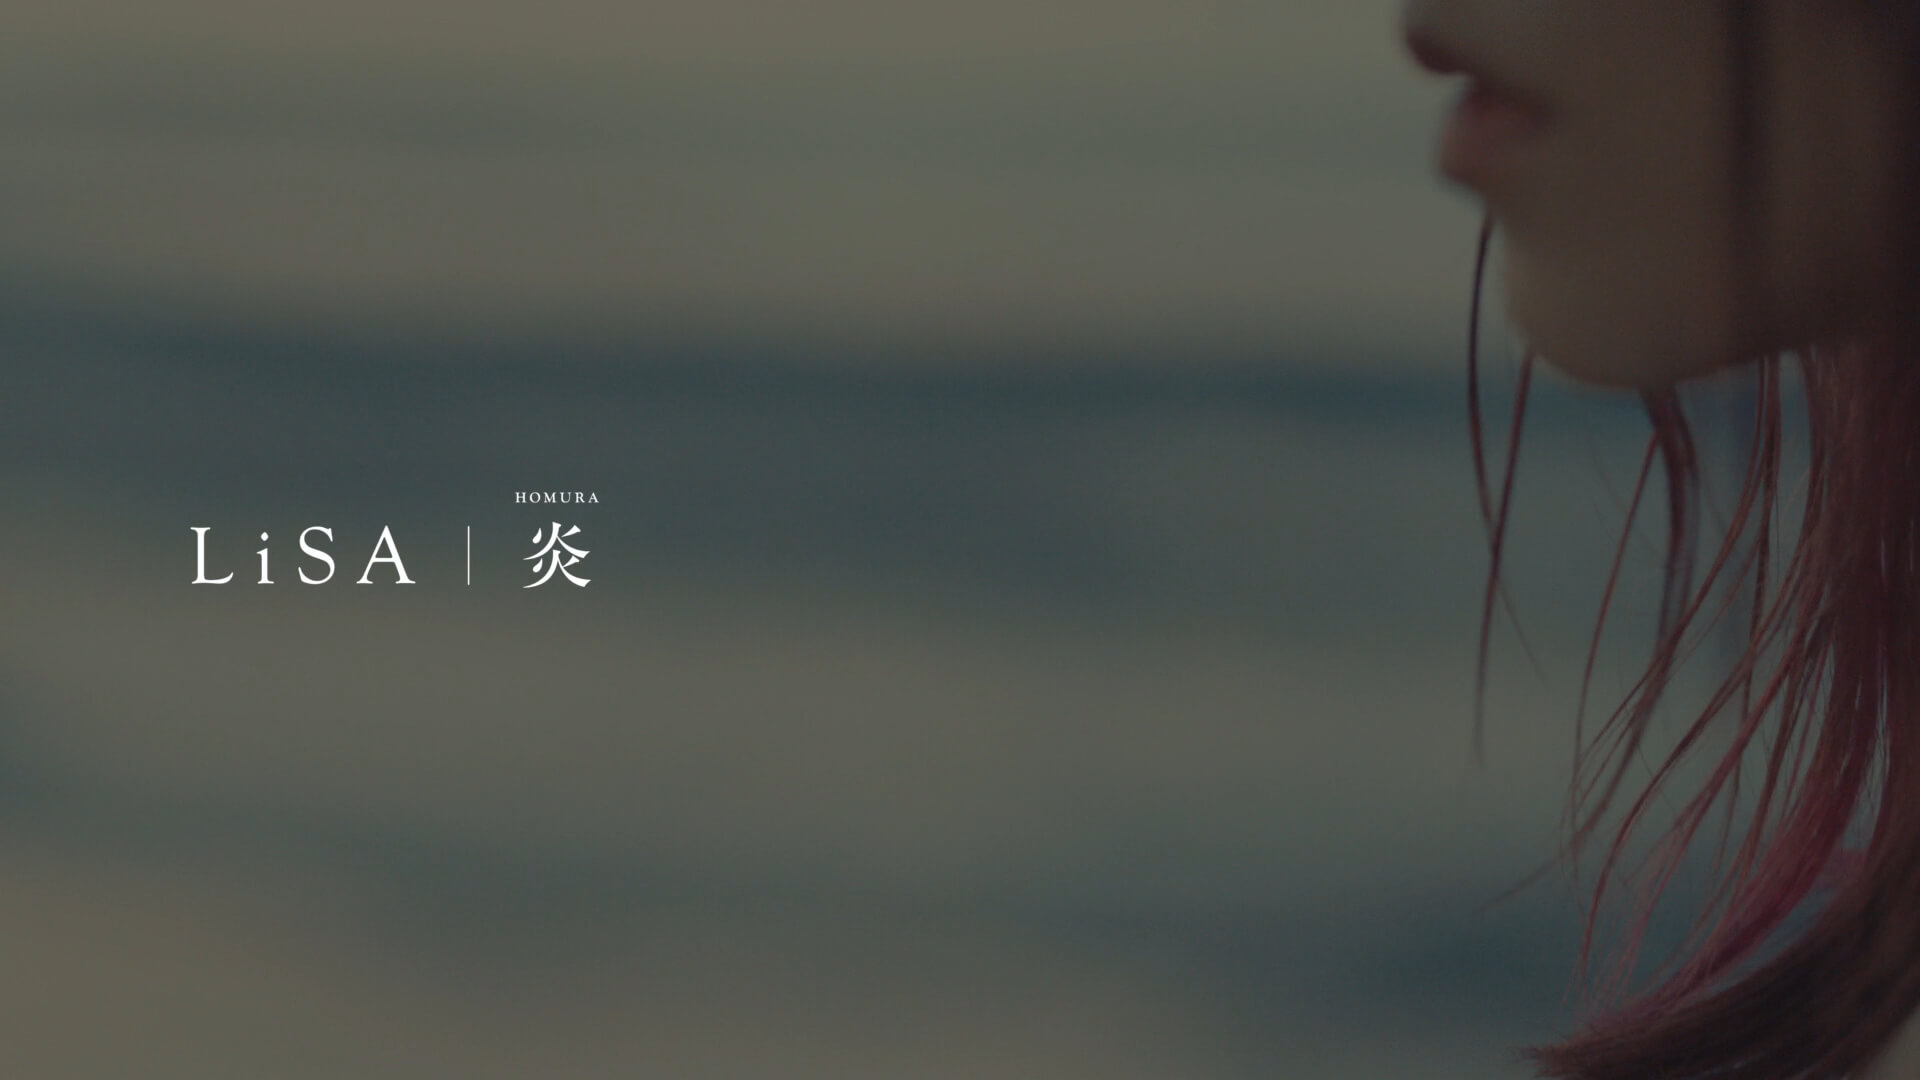 "LiSAによる『劇場版「鬼滅の刃」無限列車編』主題歌""炎""がシングルリリース決定&MVも公開!大ヒット曲""紅蓮華""を収録したアルバム『LEO-NiNE』も発表 music201013_kimetsunoyaiba_lisa_2"